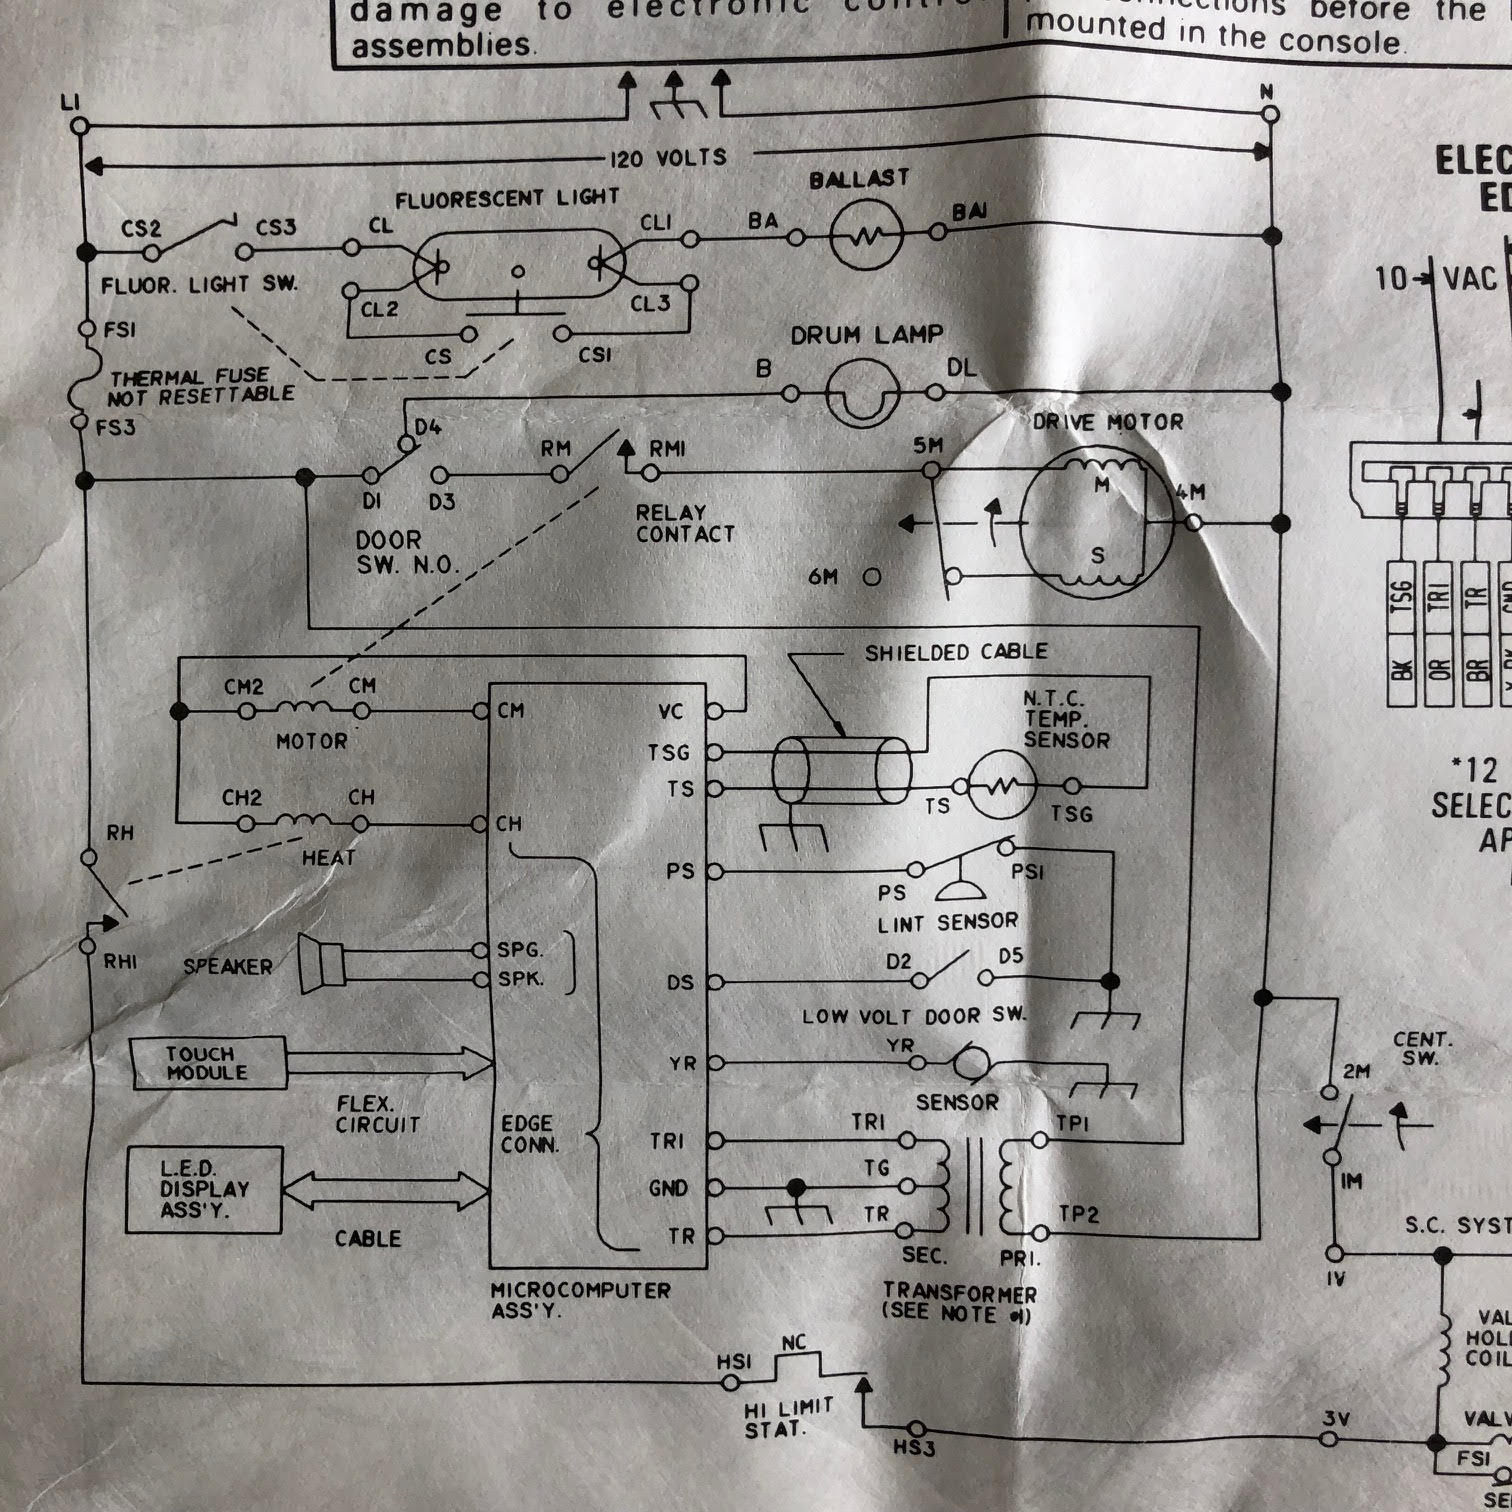 Need Help Bypass Dryer Door Switch - Appliances